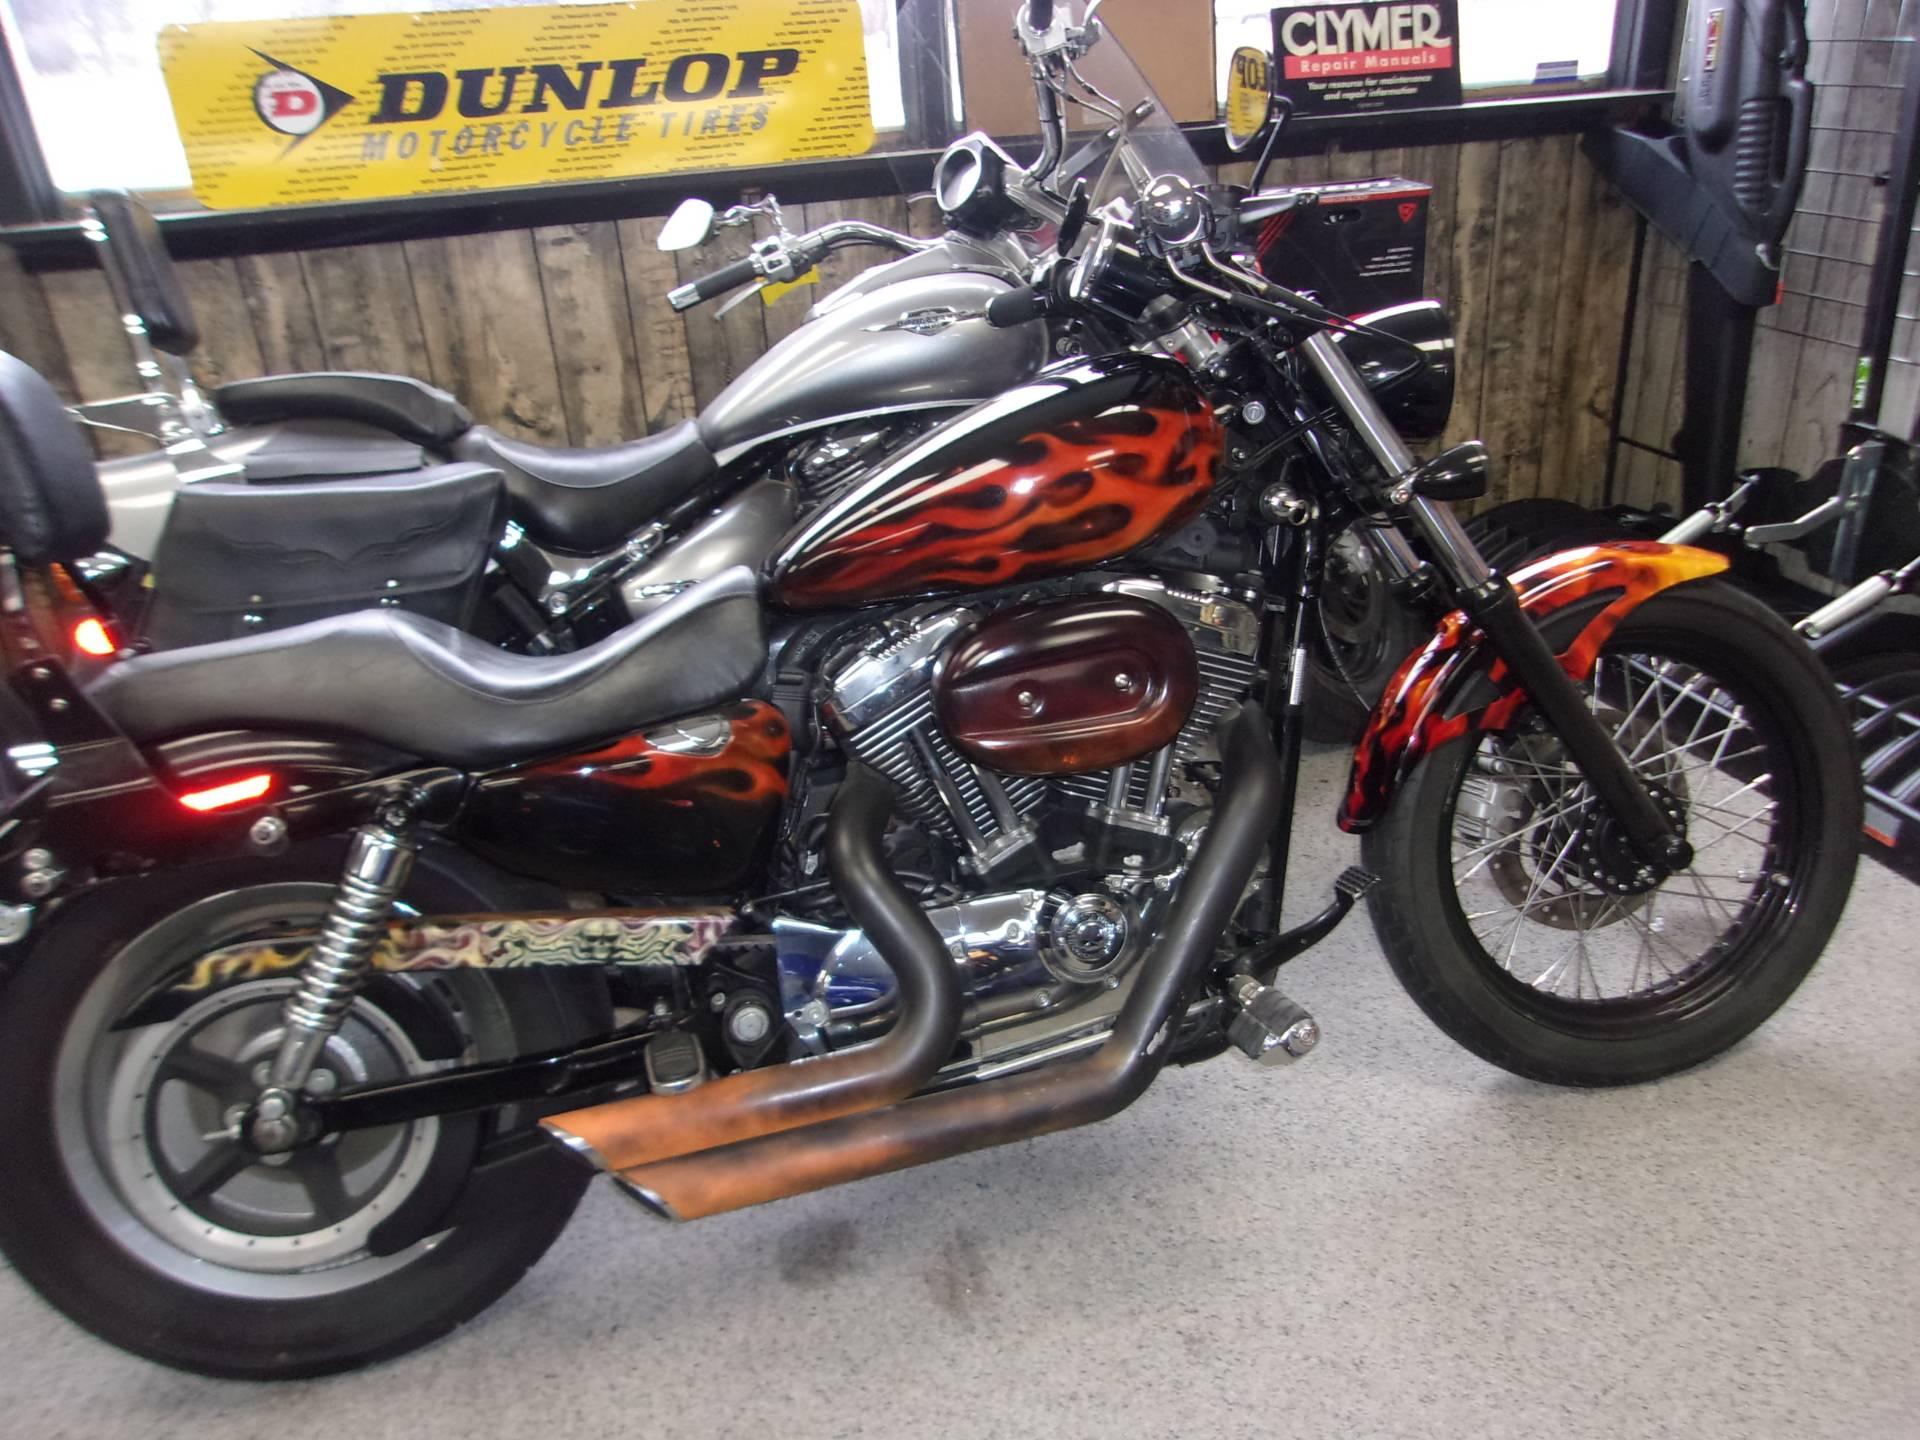 Used 2007 Harley Davidson Sportster 1200 Custom Motorcycles In Mukwonago Wi